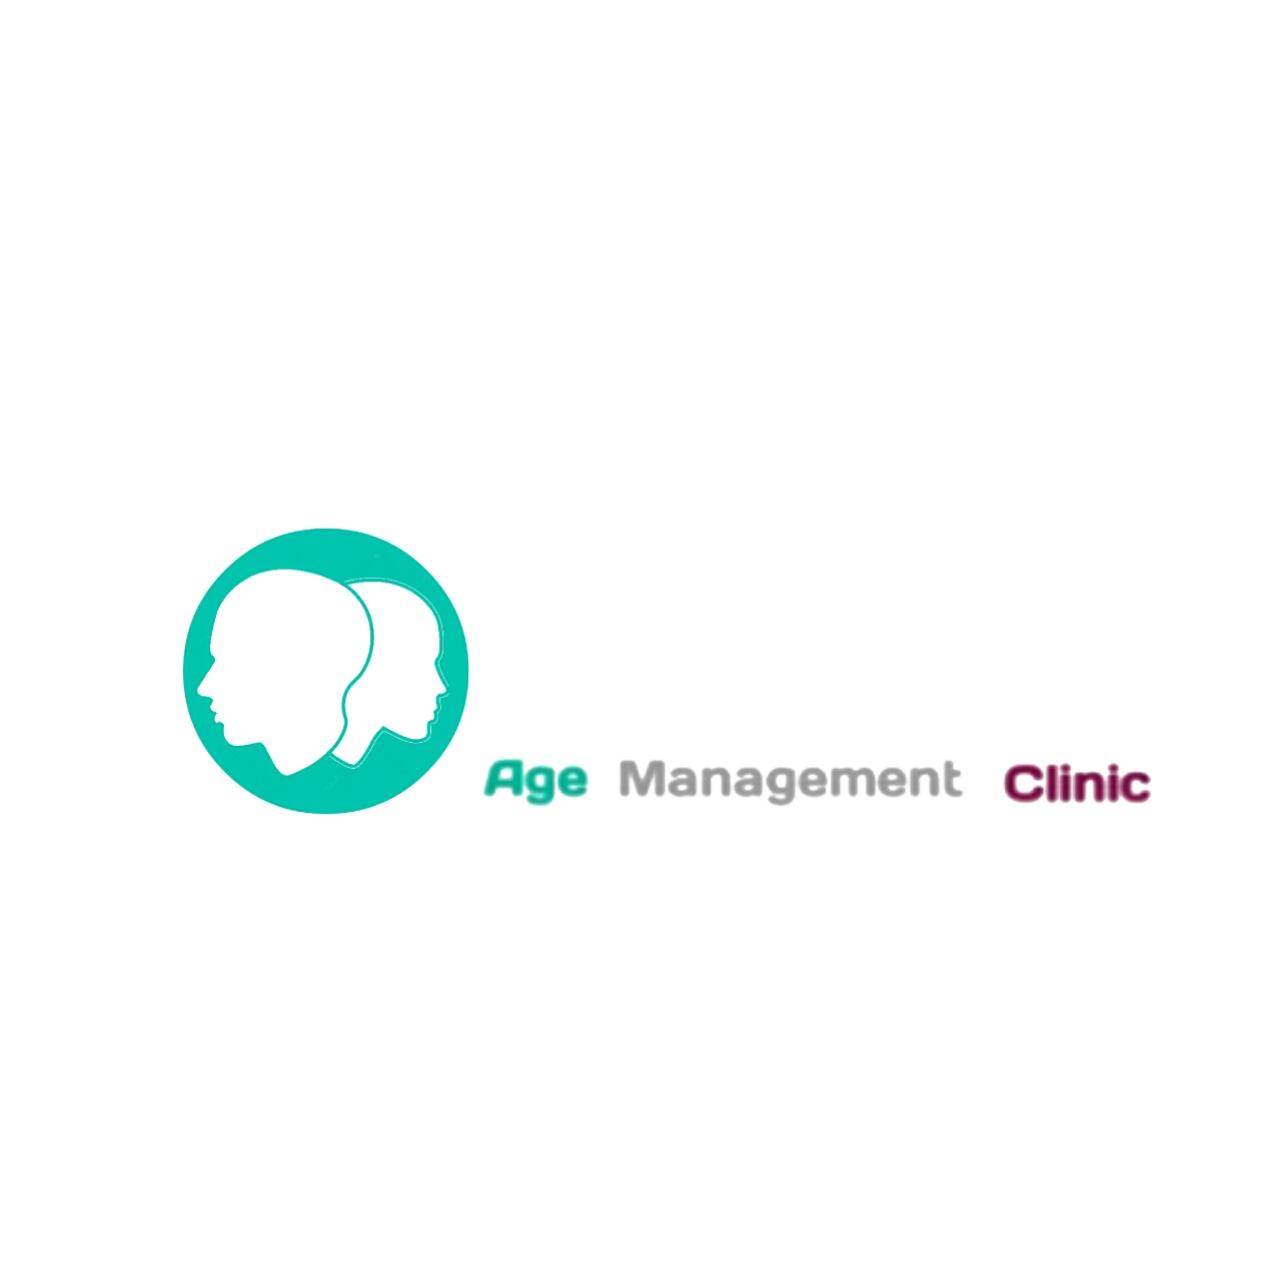 Логотип для медицинского центра (клиники)  фото f_4375b9c544fa91fa.jpg